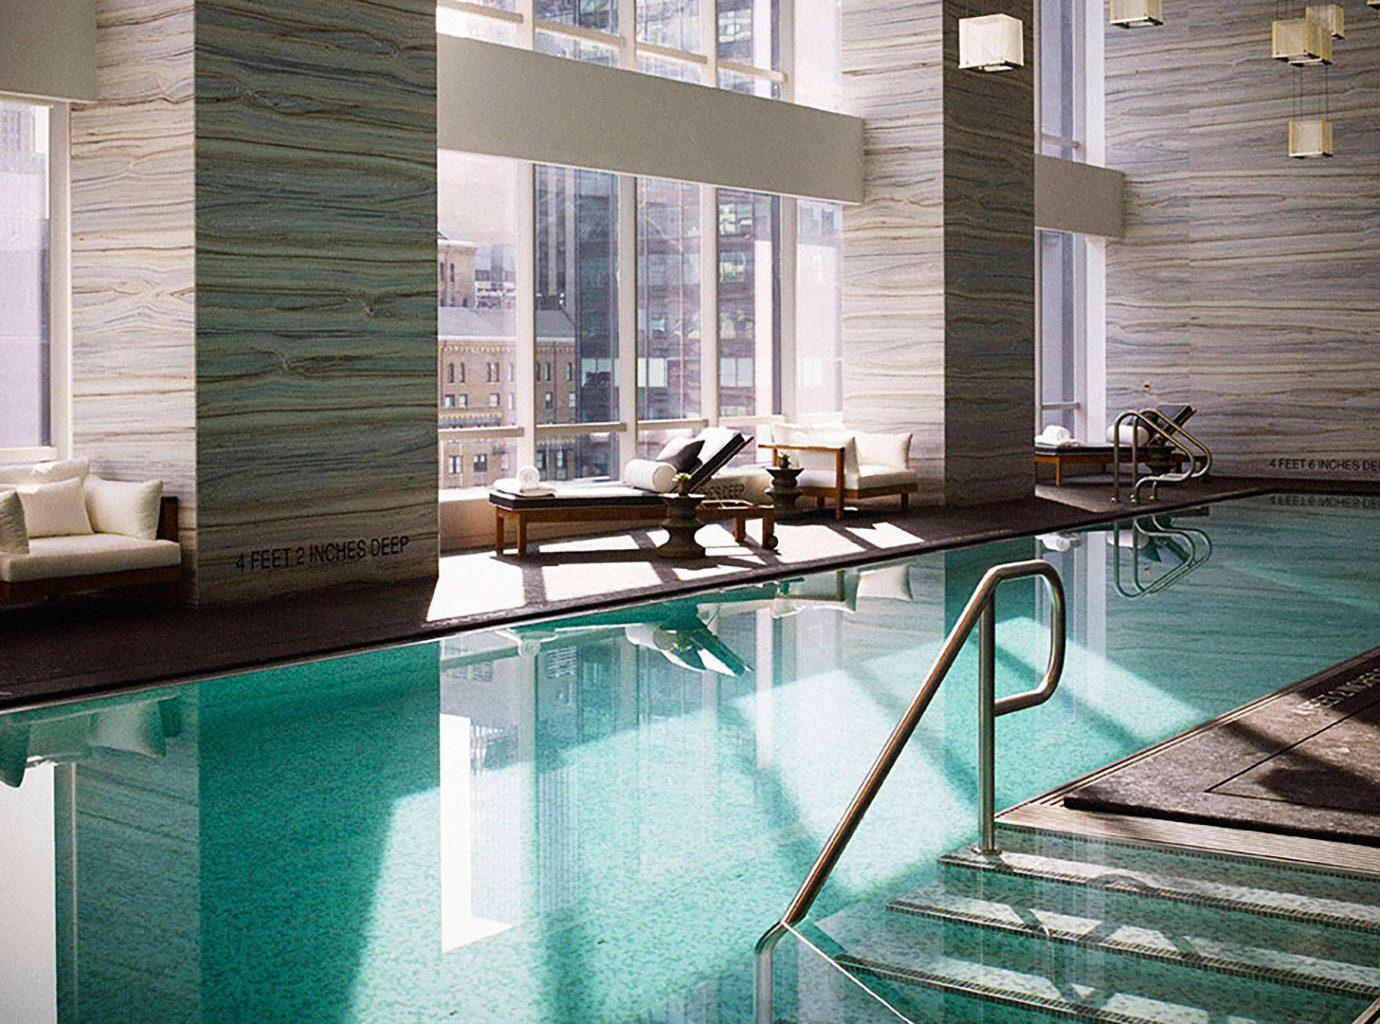 Hotels Lounge Luxury NYC Pool window swimming pool floor indoor property room house estate condominium interior design home backyard furniture